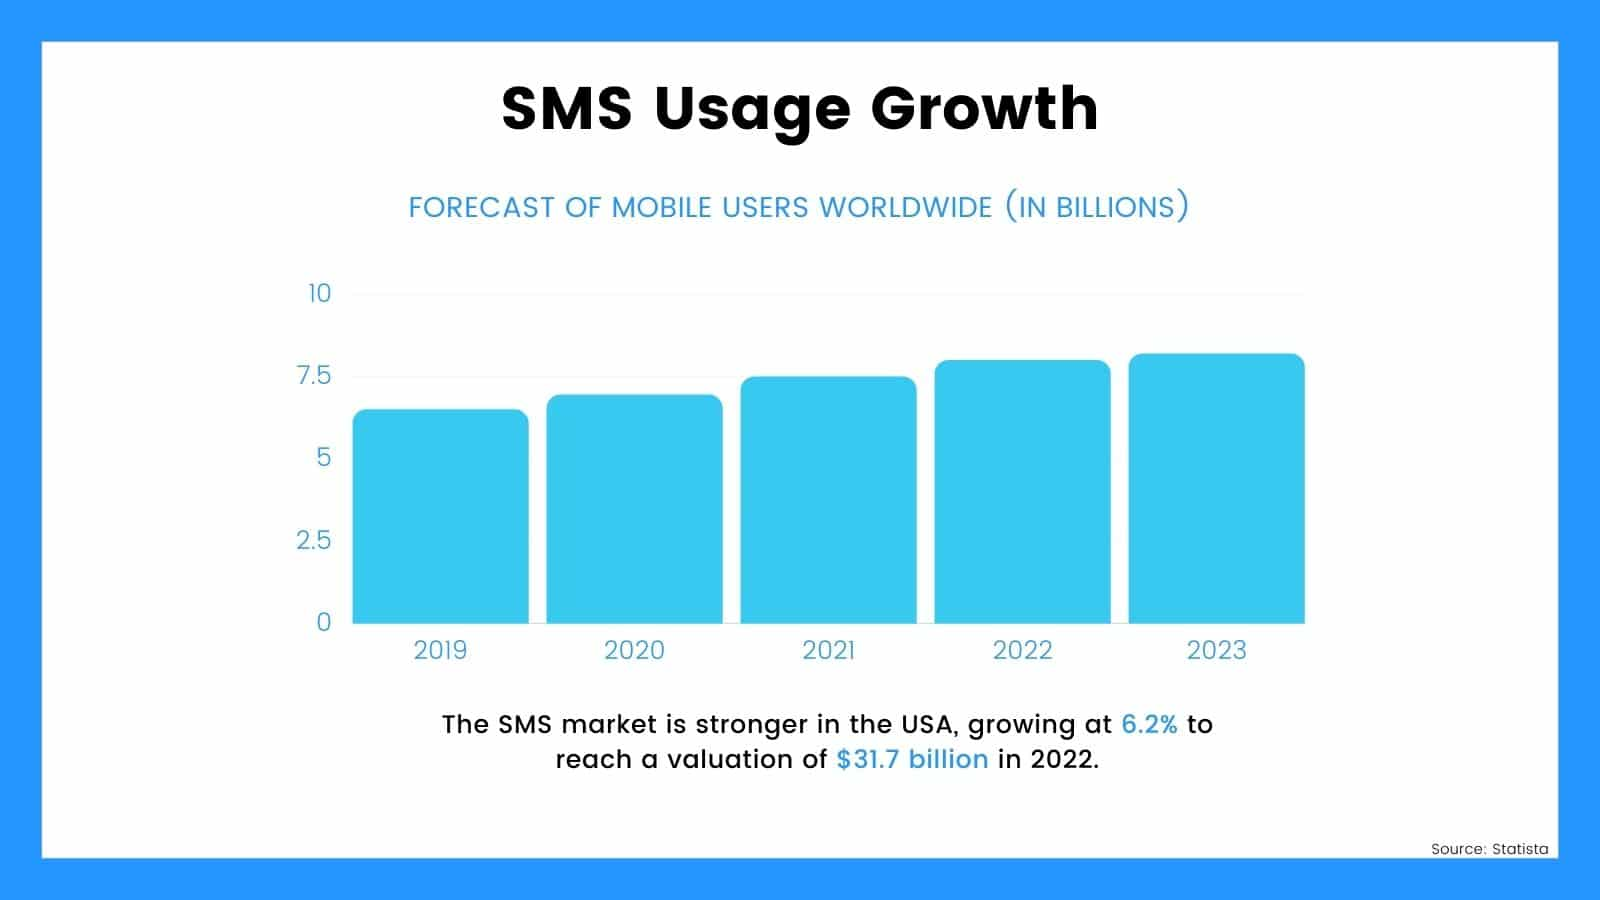 SMS Usage growth 2019-2023